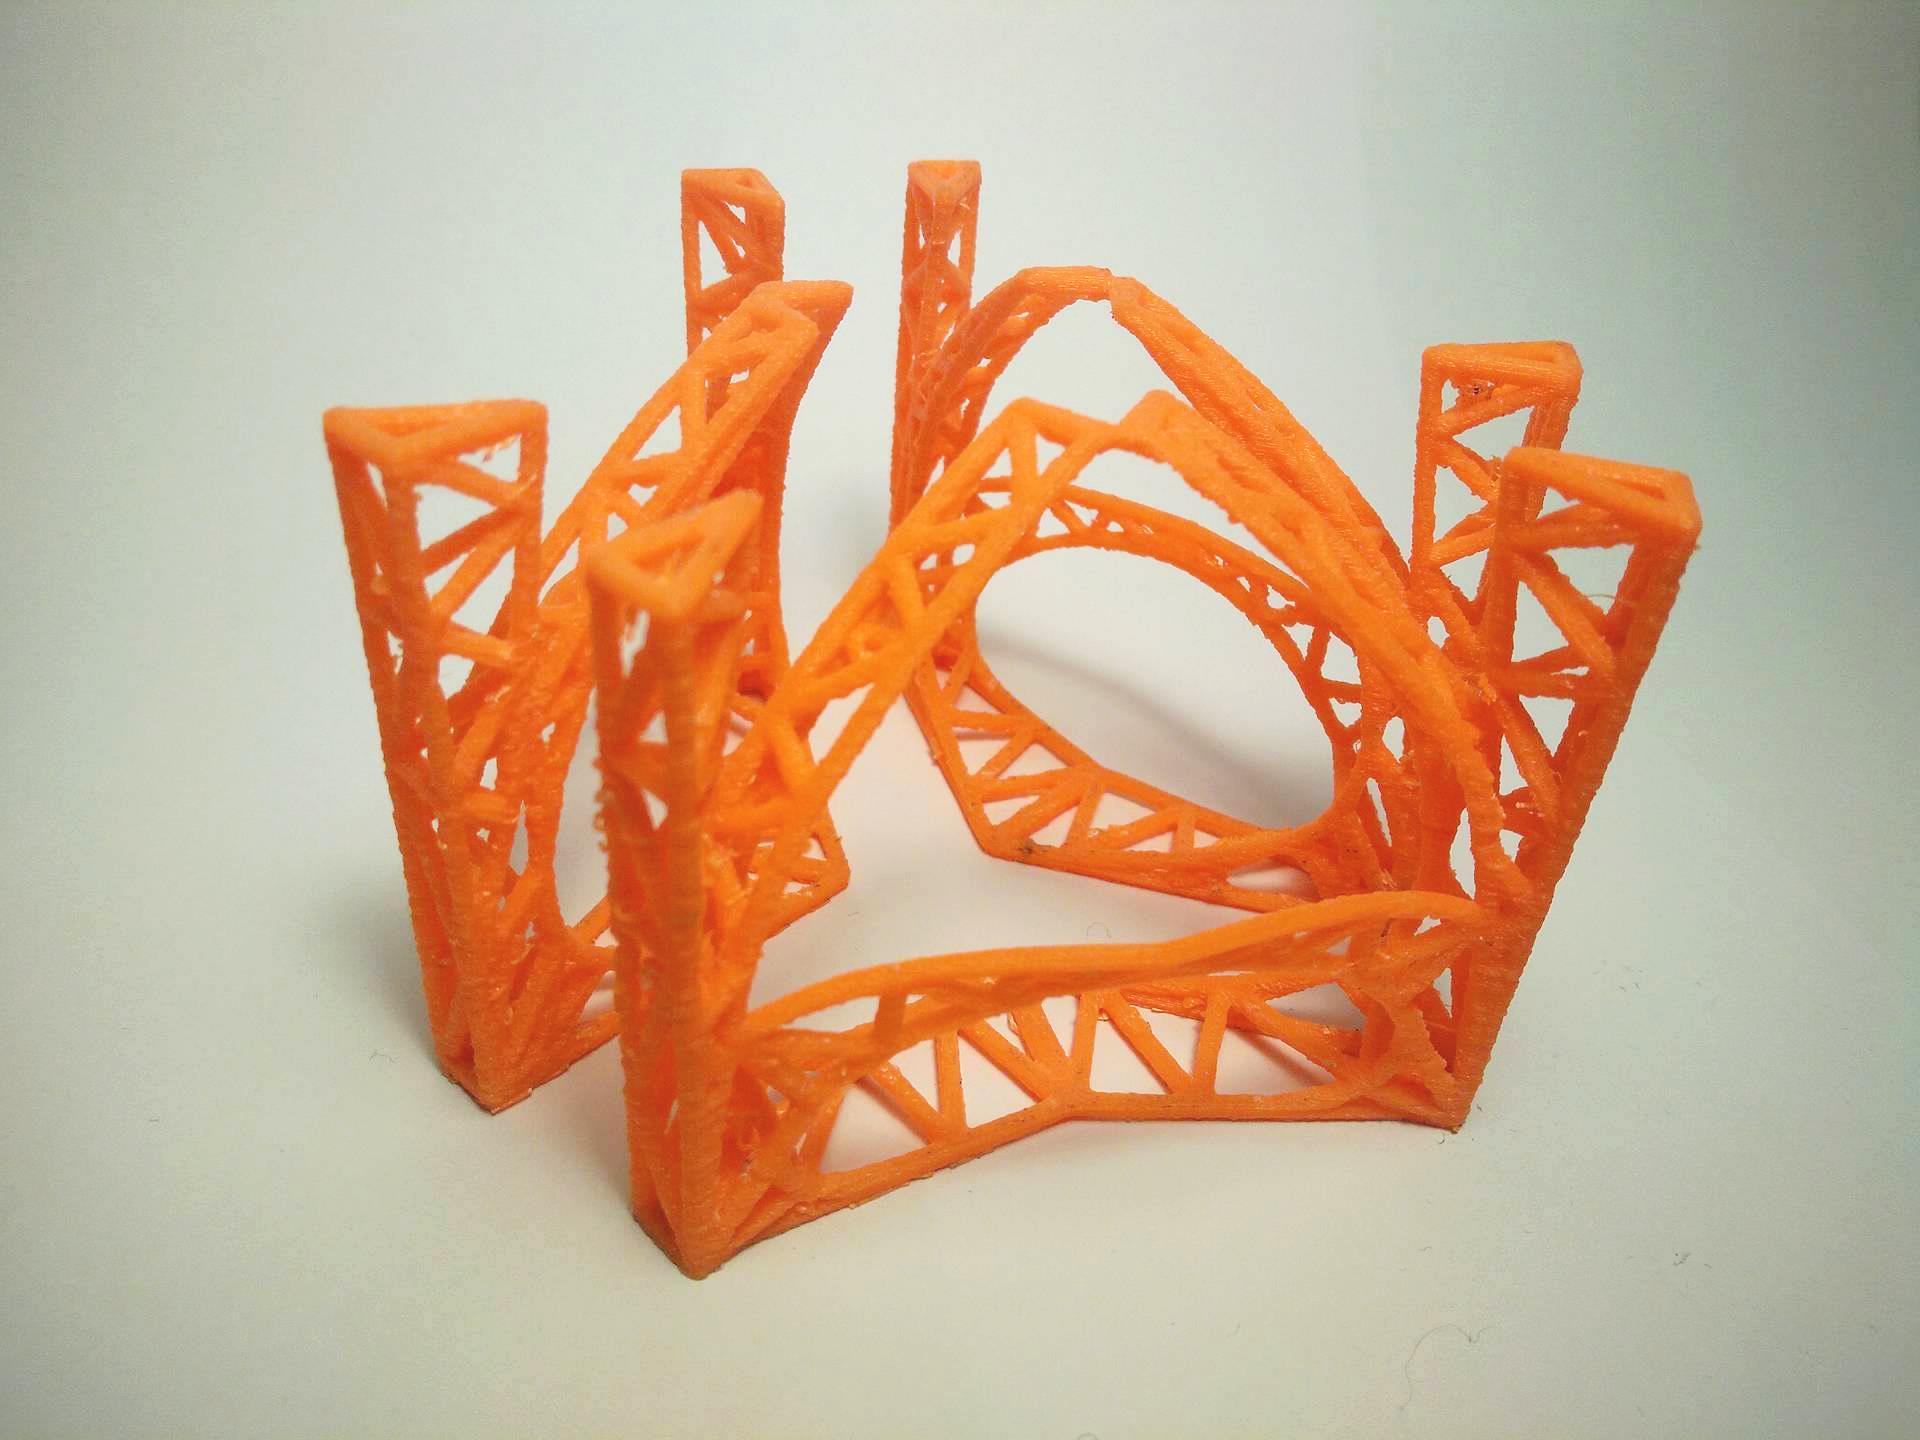 3D print Campingaz